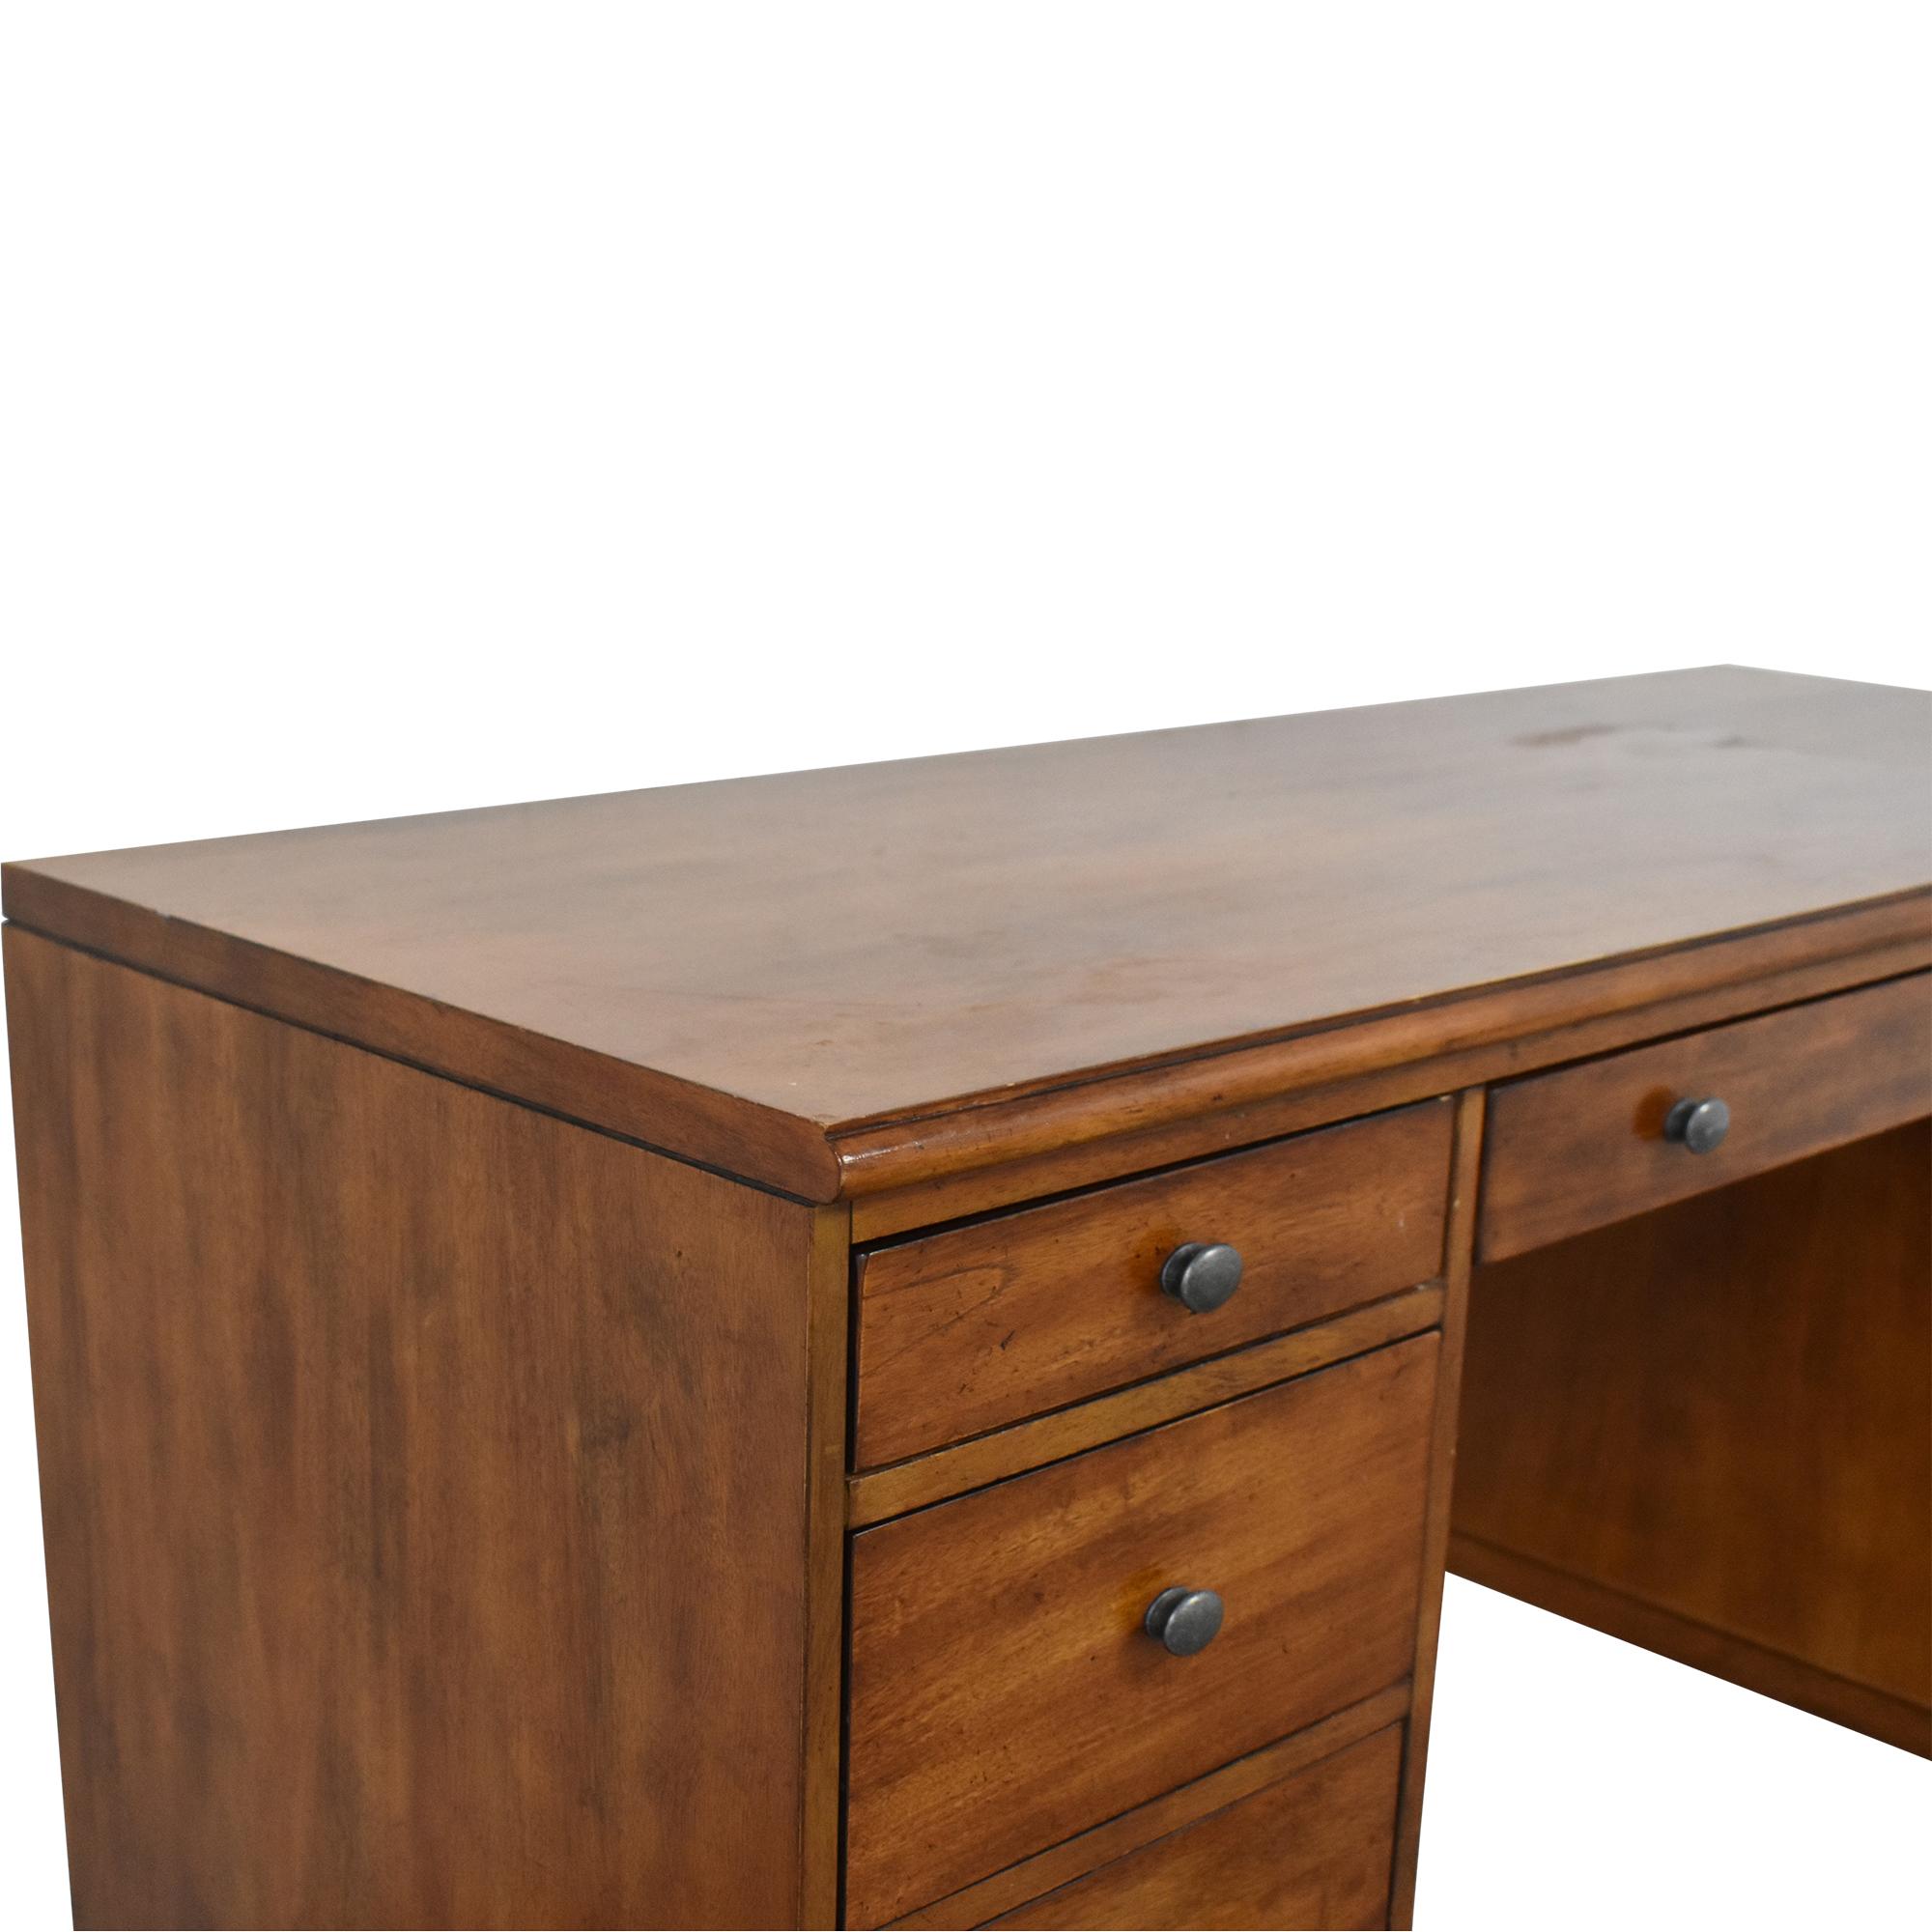 Ethan Allen Ethan Allen Hawke Double Pedestal Desk dimensions